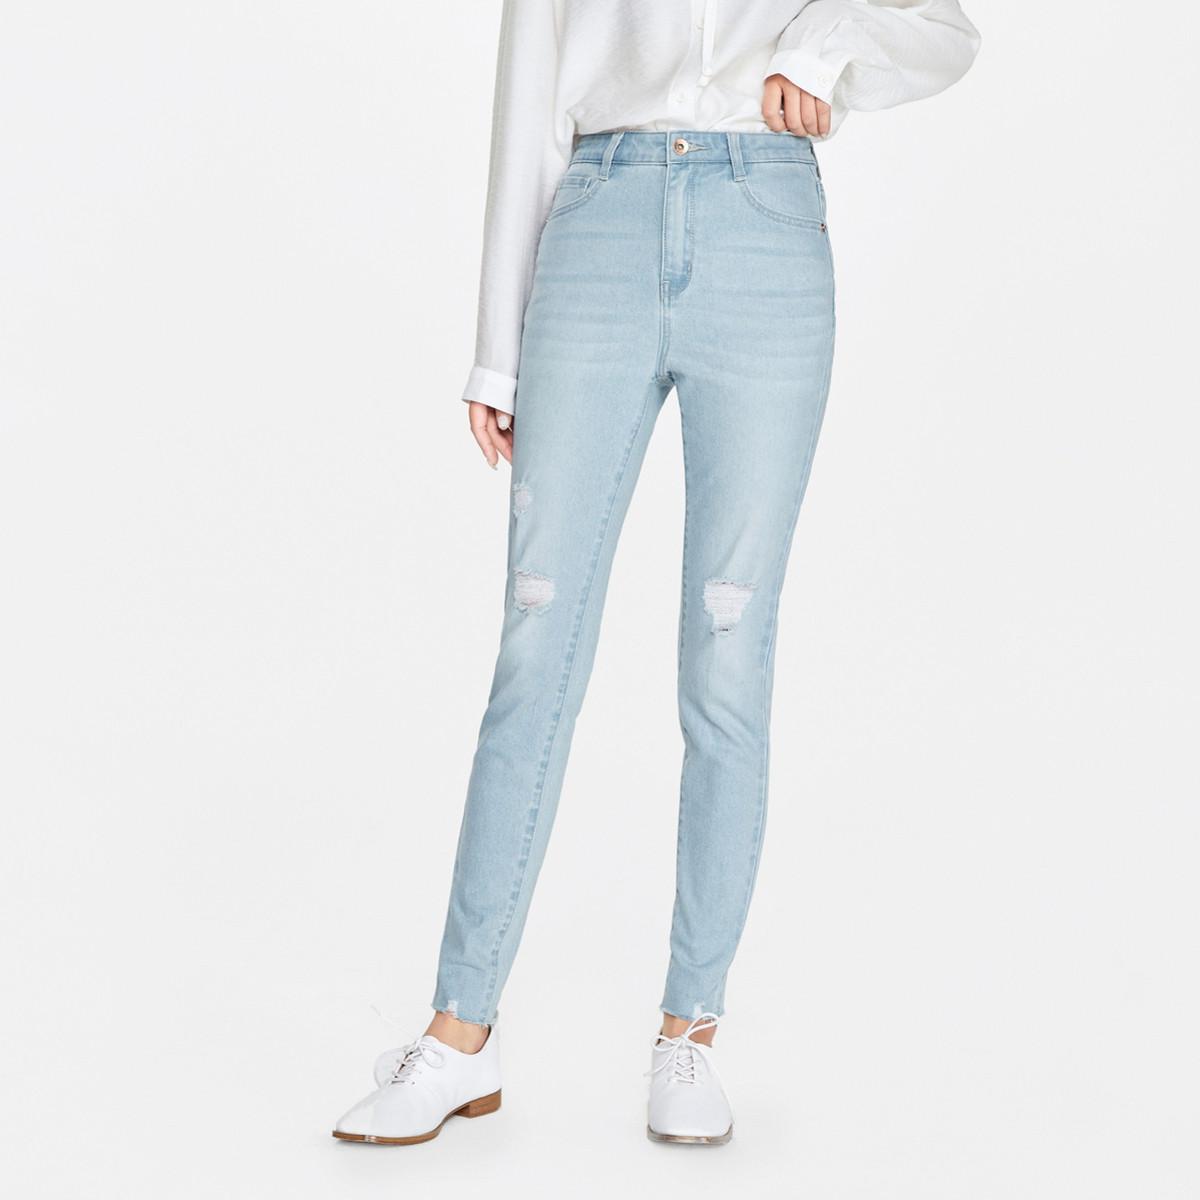 Semir 森马  19A120240144 女士九分牛仔裤